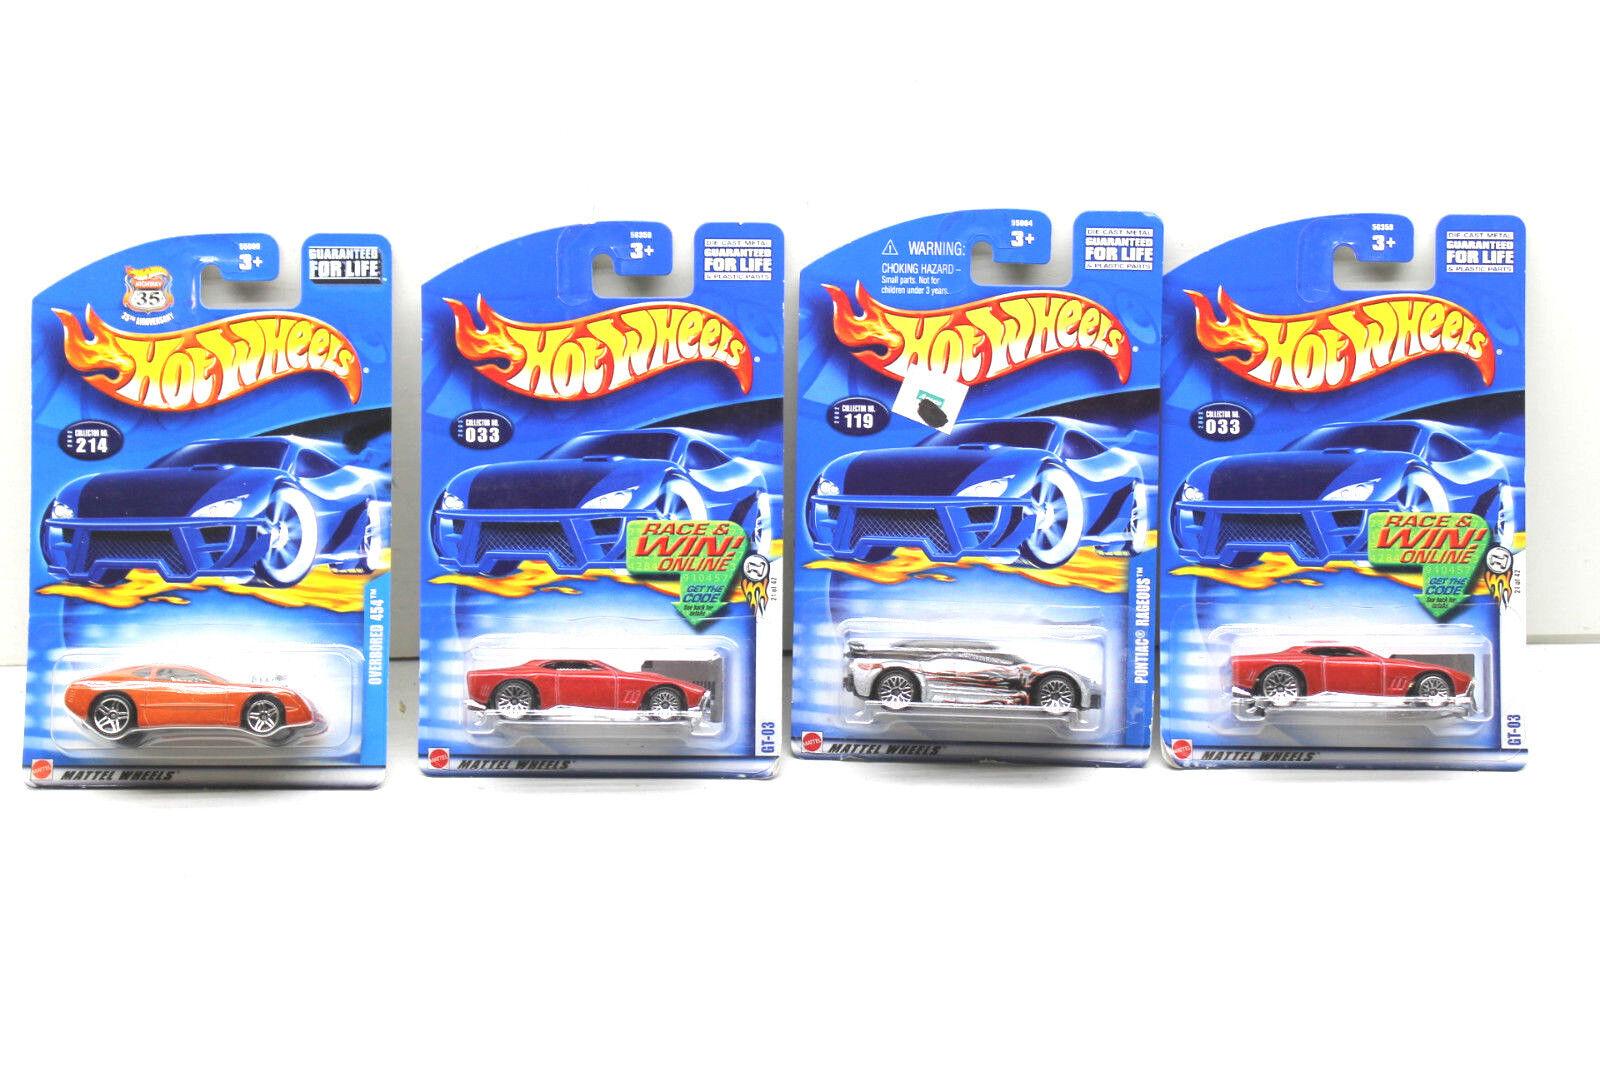 21 21 21 PC tono muscular Hot Wheels Pontiac + Die Cast Lote Coches 1997 - 2001 Mattel NOC 8c748a